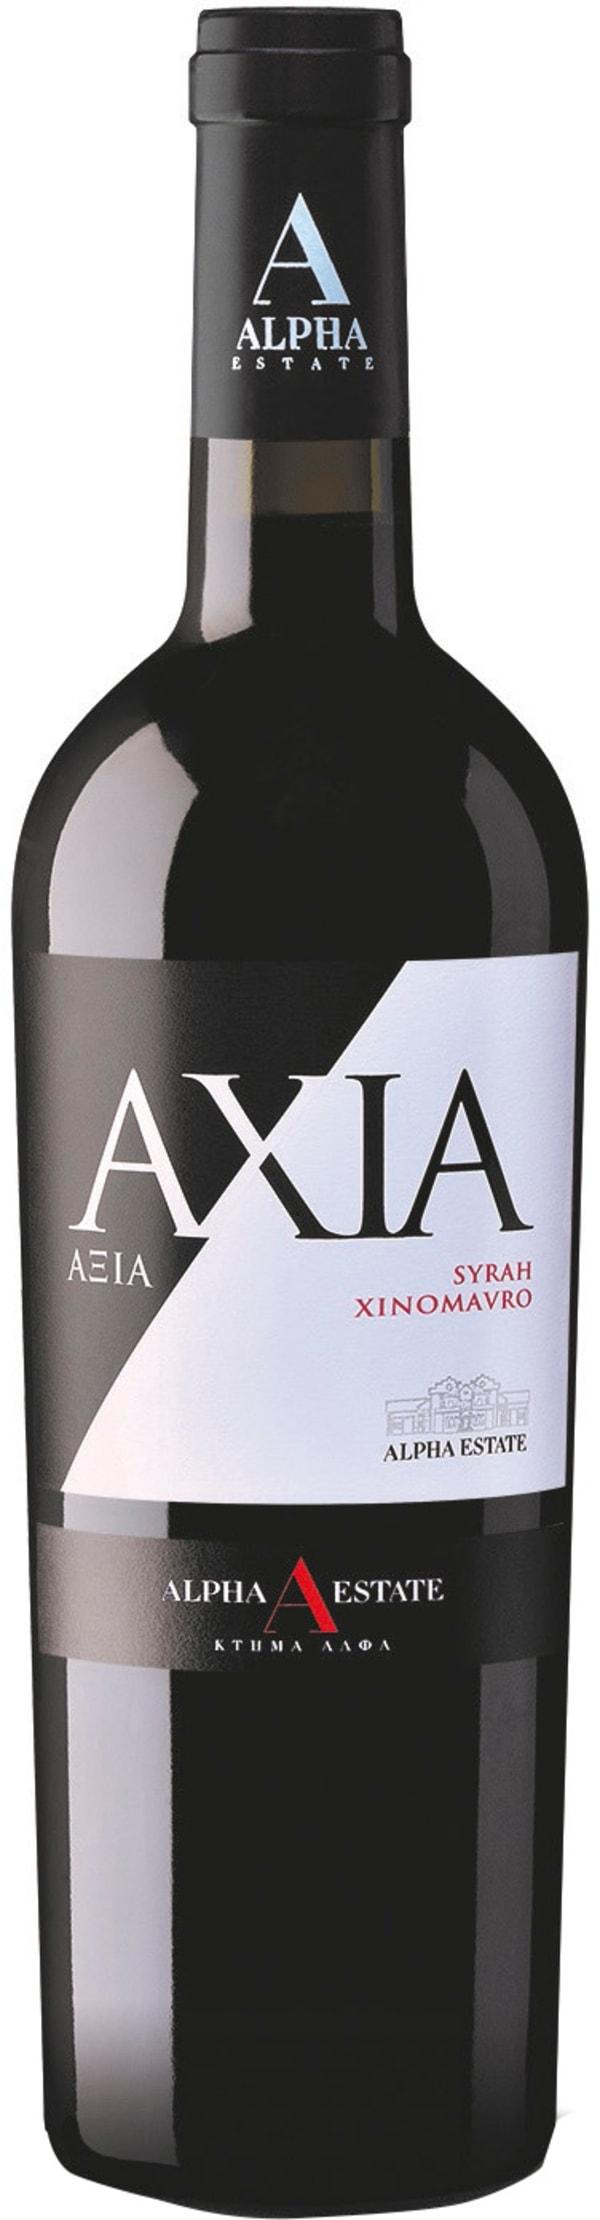 Alpha Estate Axia Syrah Xinomavro 2015